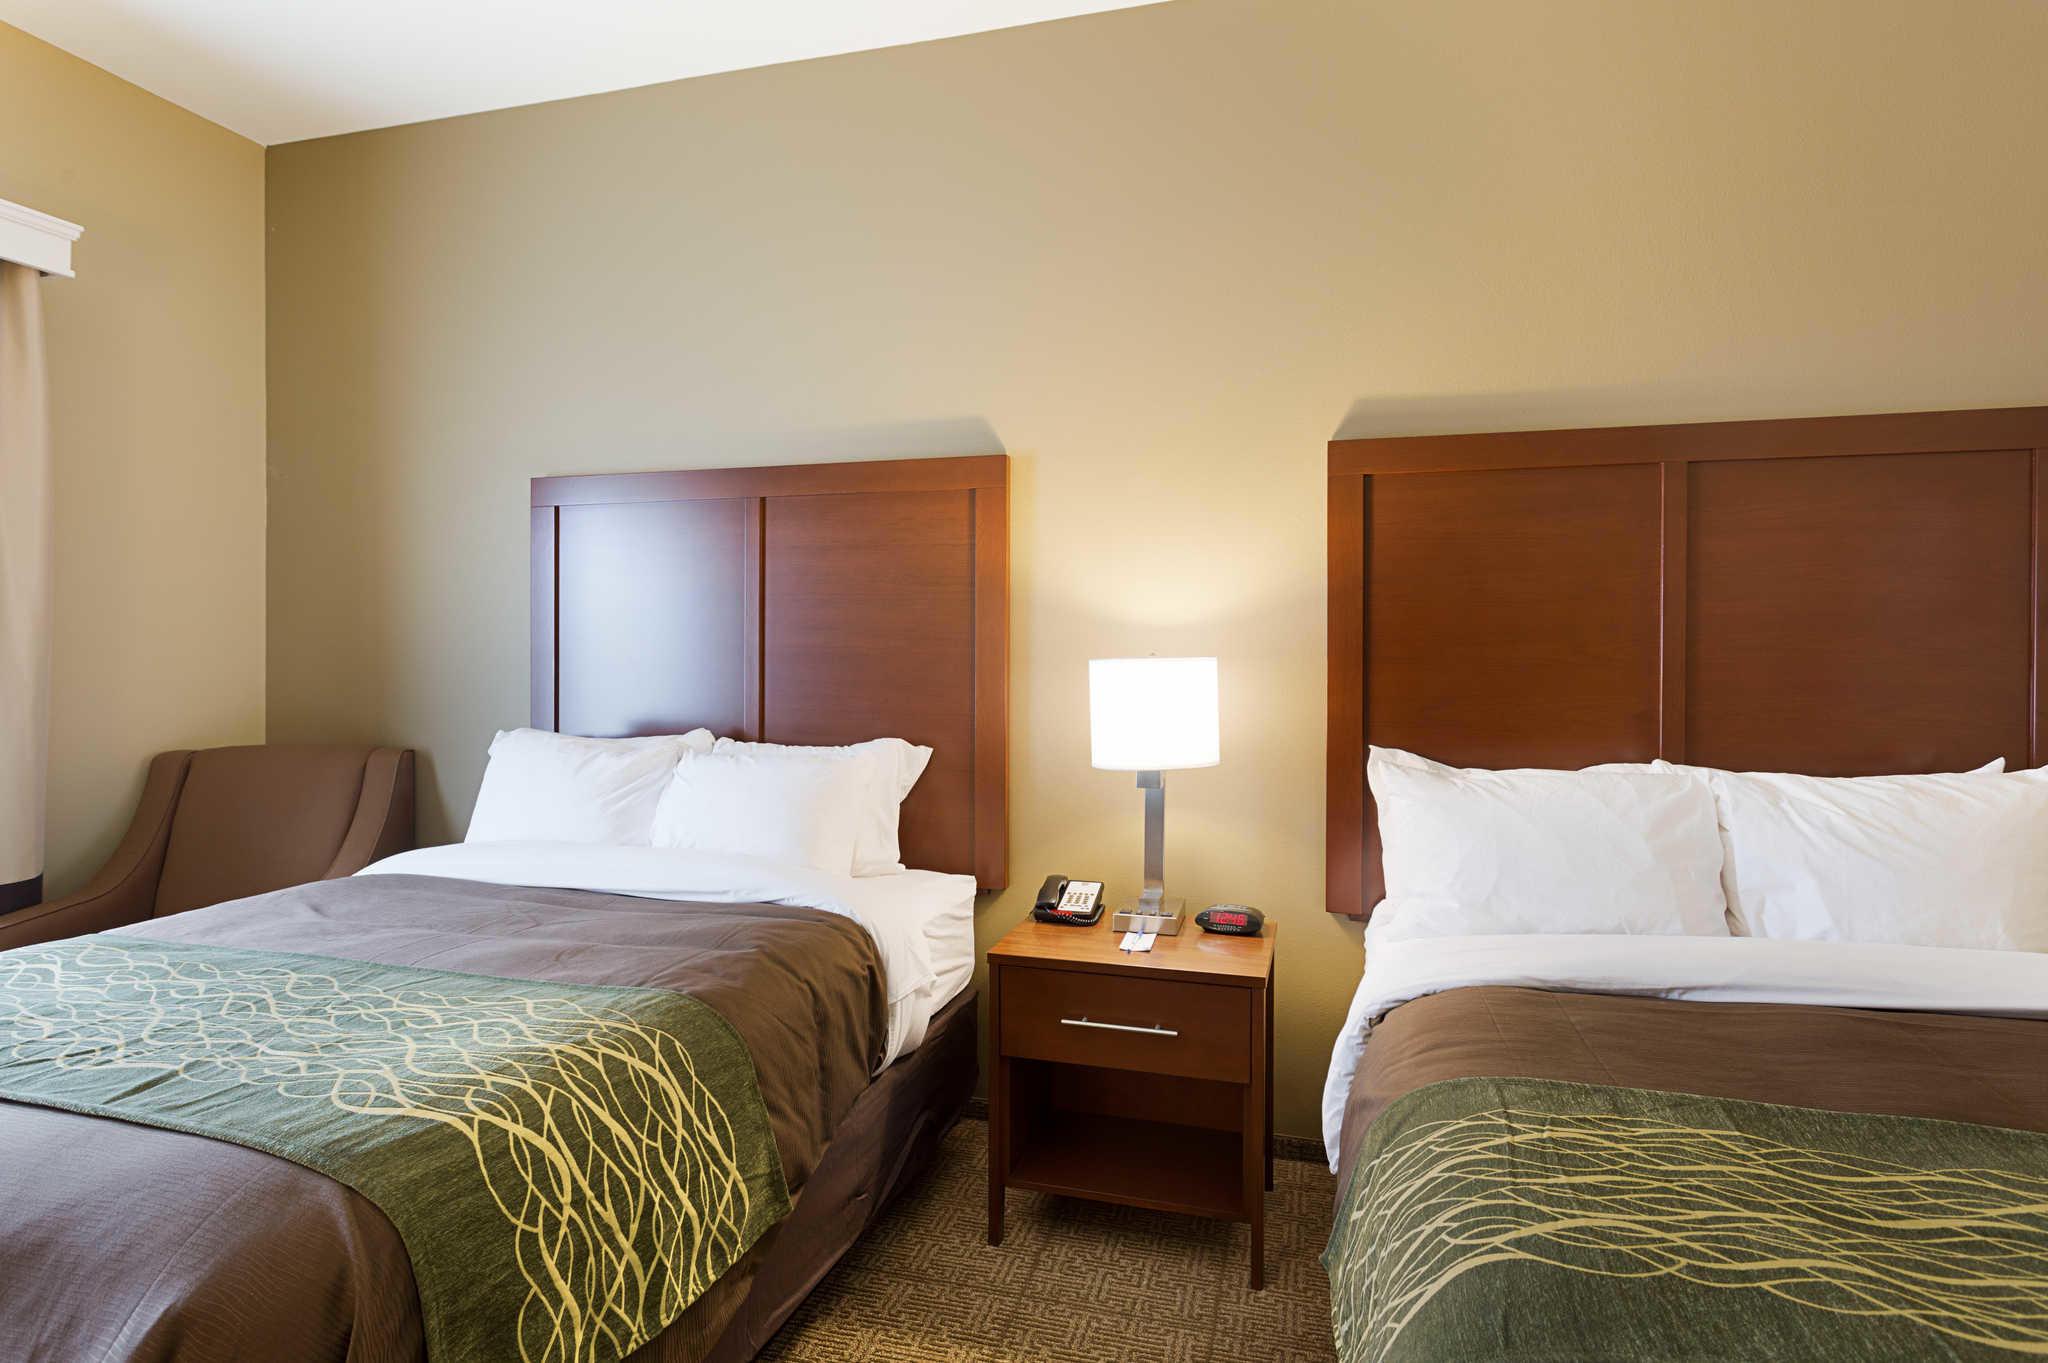 Royal Hideaway Playacar - Cancun - Mexico Hotels - Apple